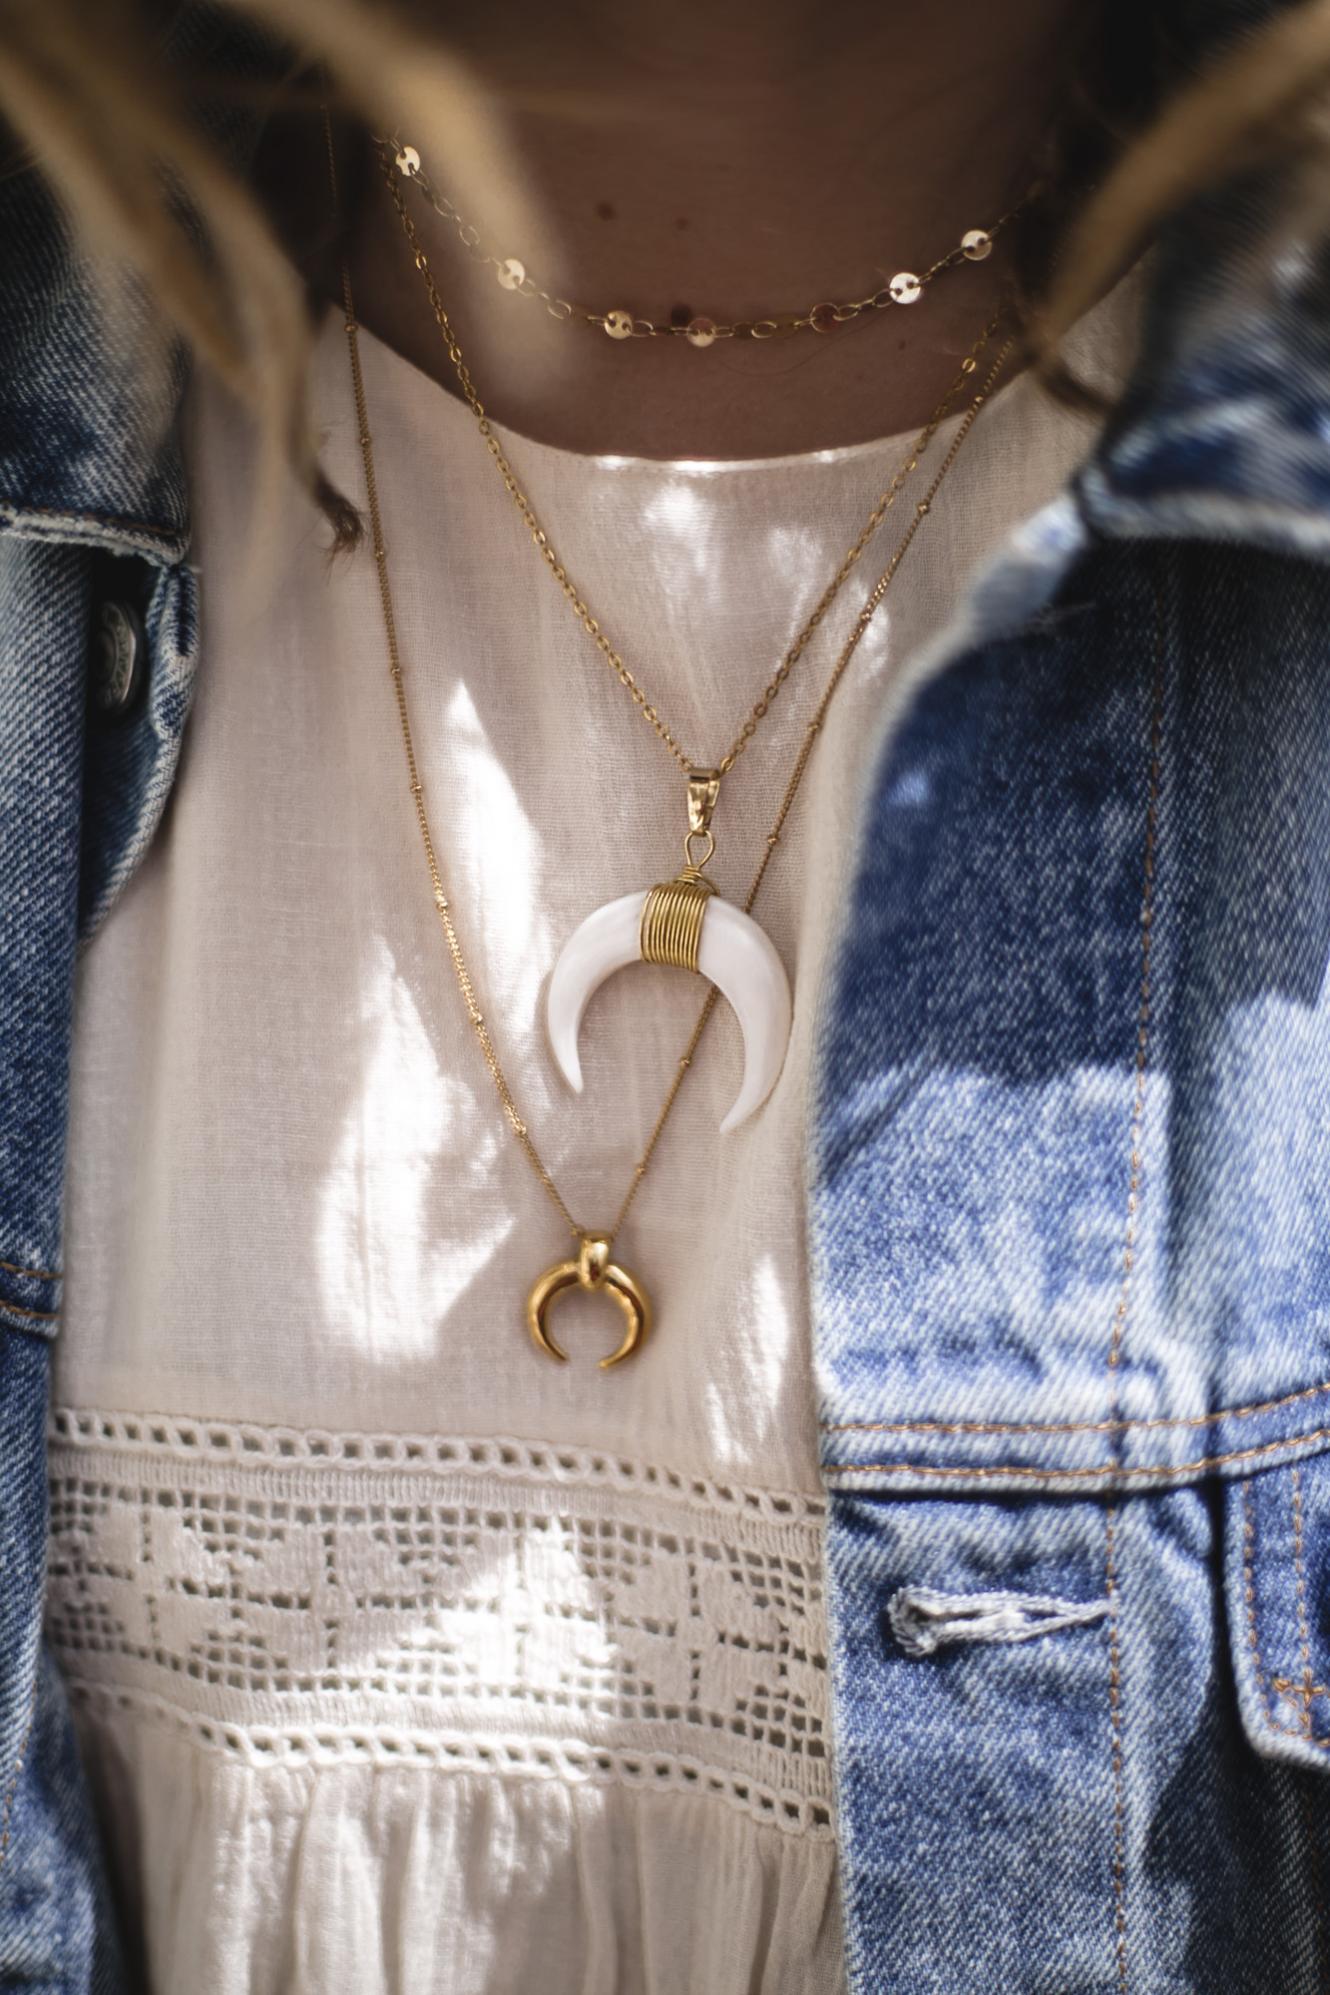 Emma Hill wearing denim jacket, boho dress, layered gold horn necklaces